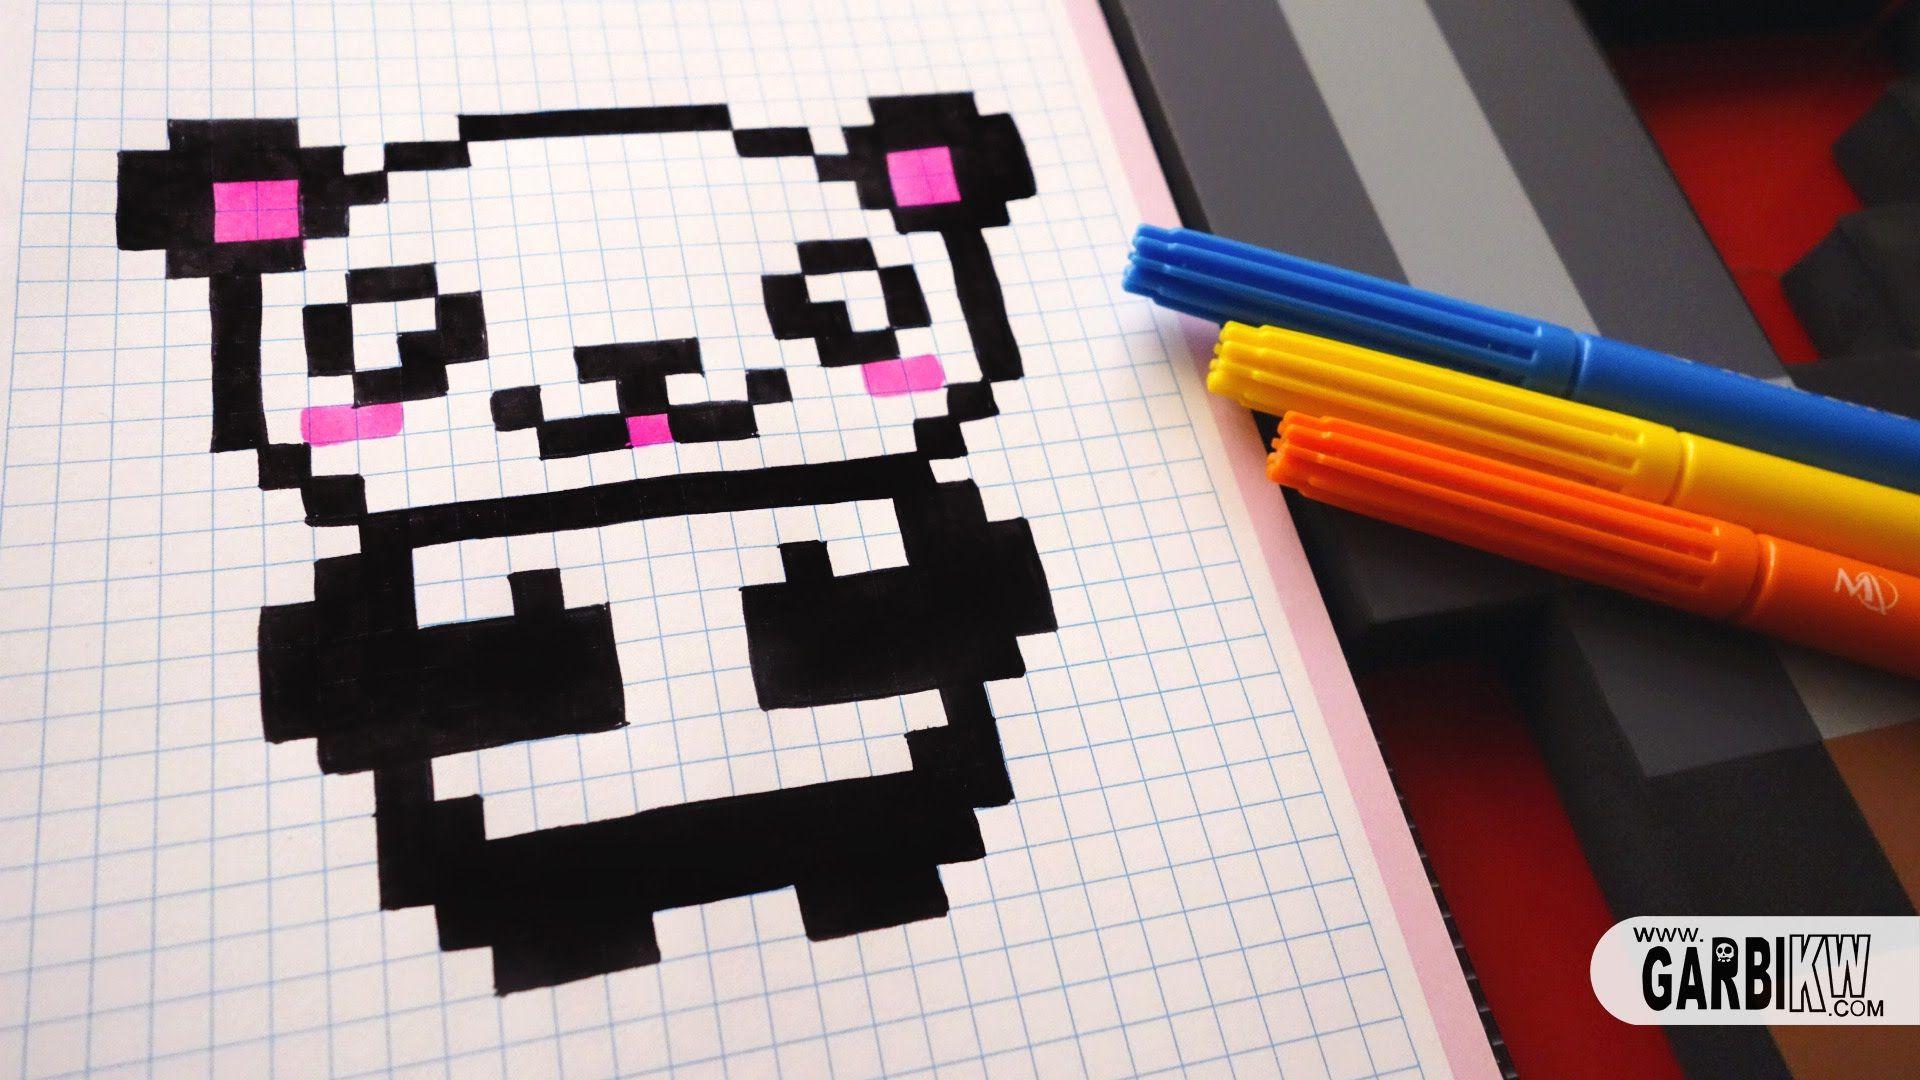 Handmade Pixel Art How To Draw Kawaii Panda Pixelart Pixel Art Pokemon Pixel Art Pix Art